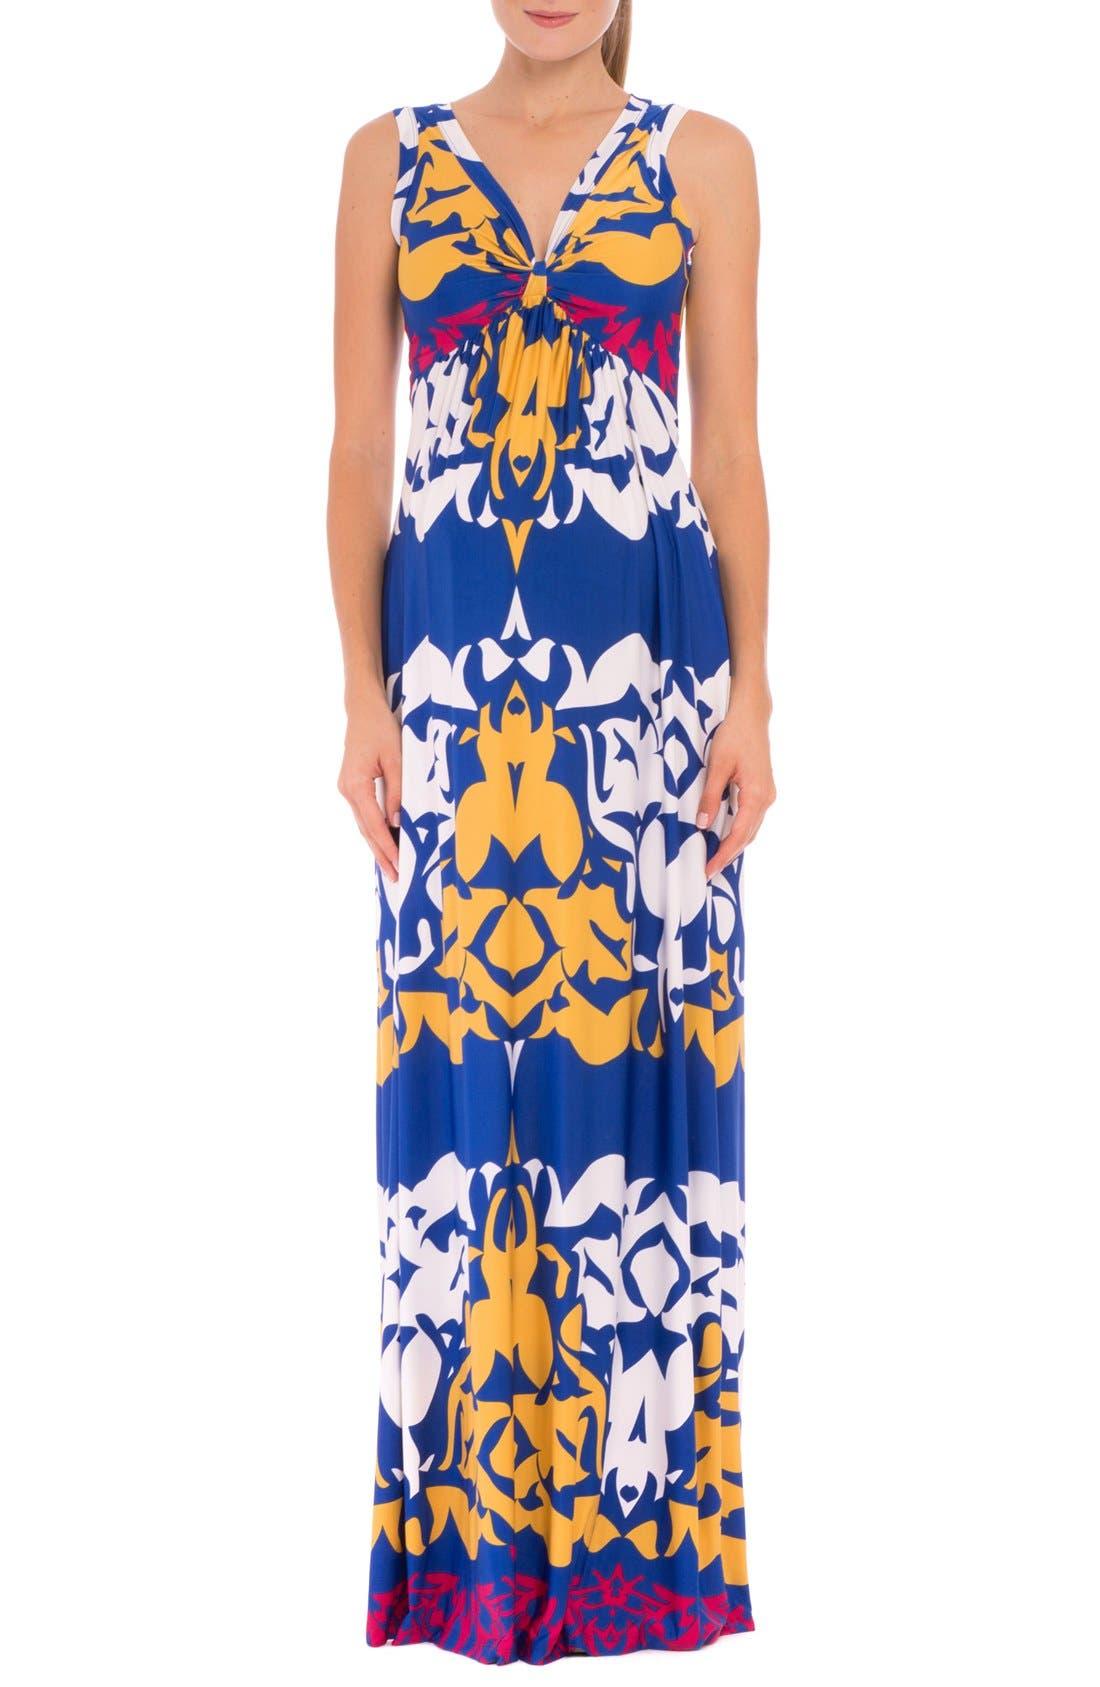 Olian 'Ellie' Print Maternity Maxi Dress